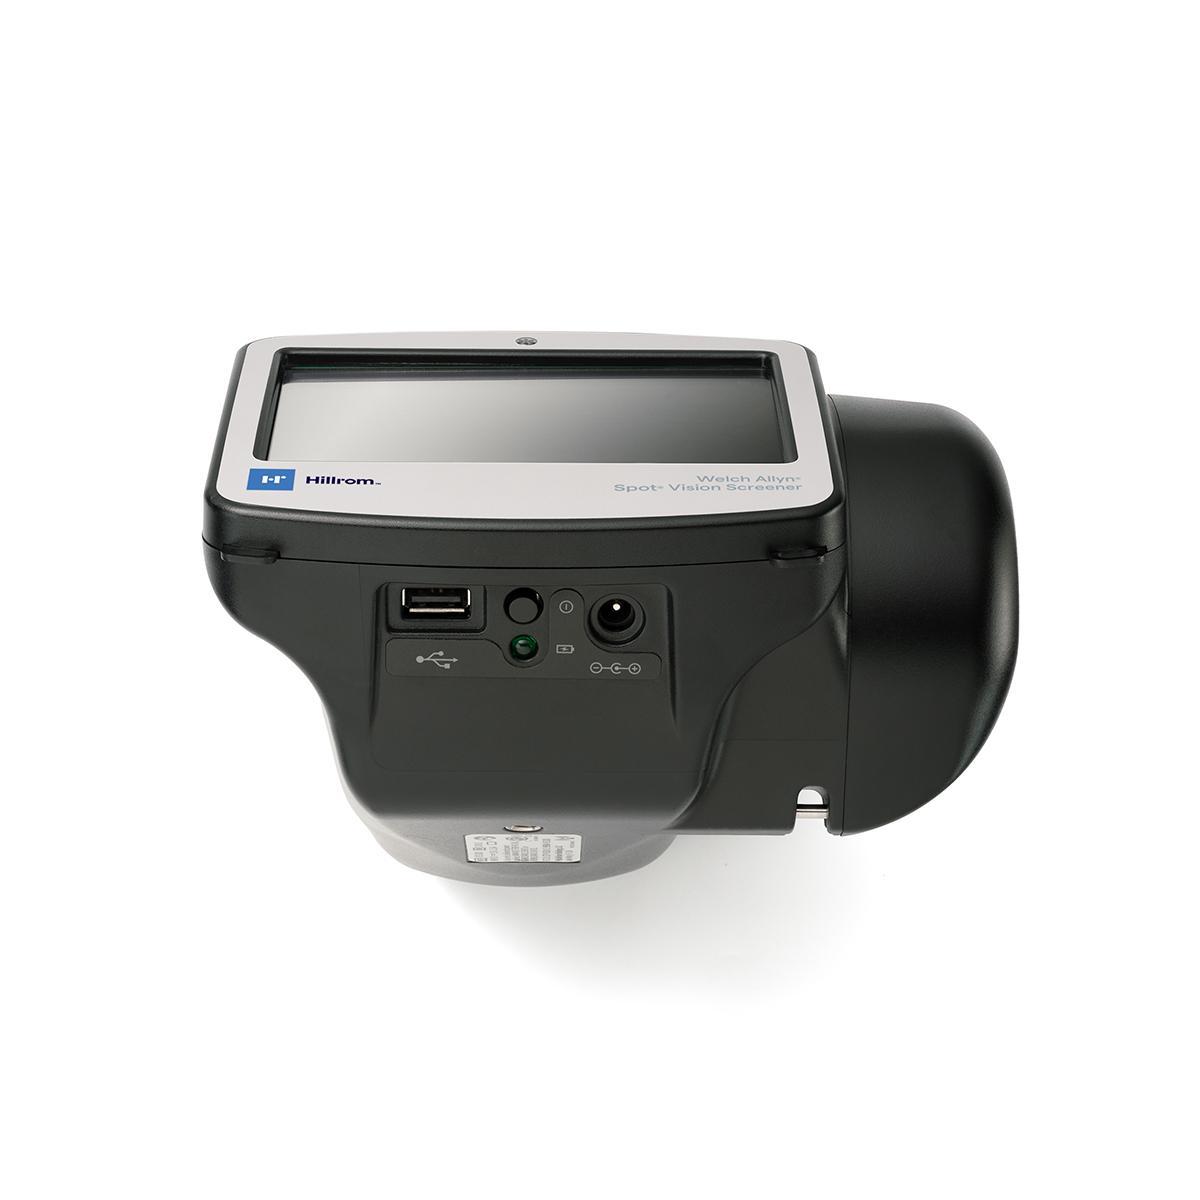 Spot® Vision Screener, bottom view, displaying ports